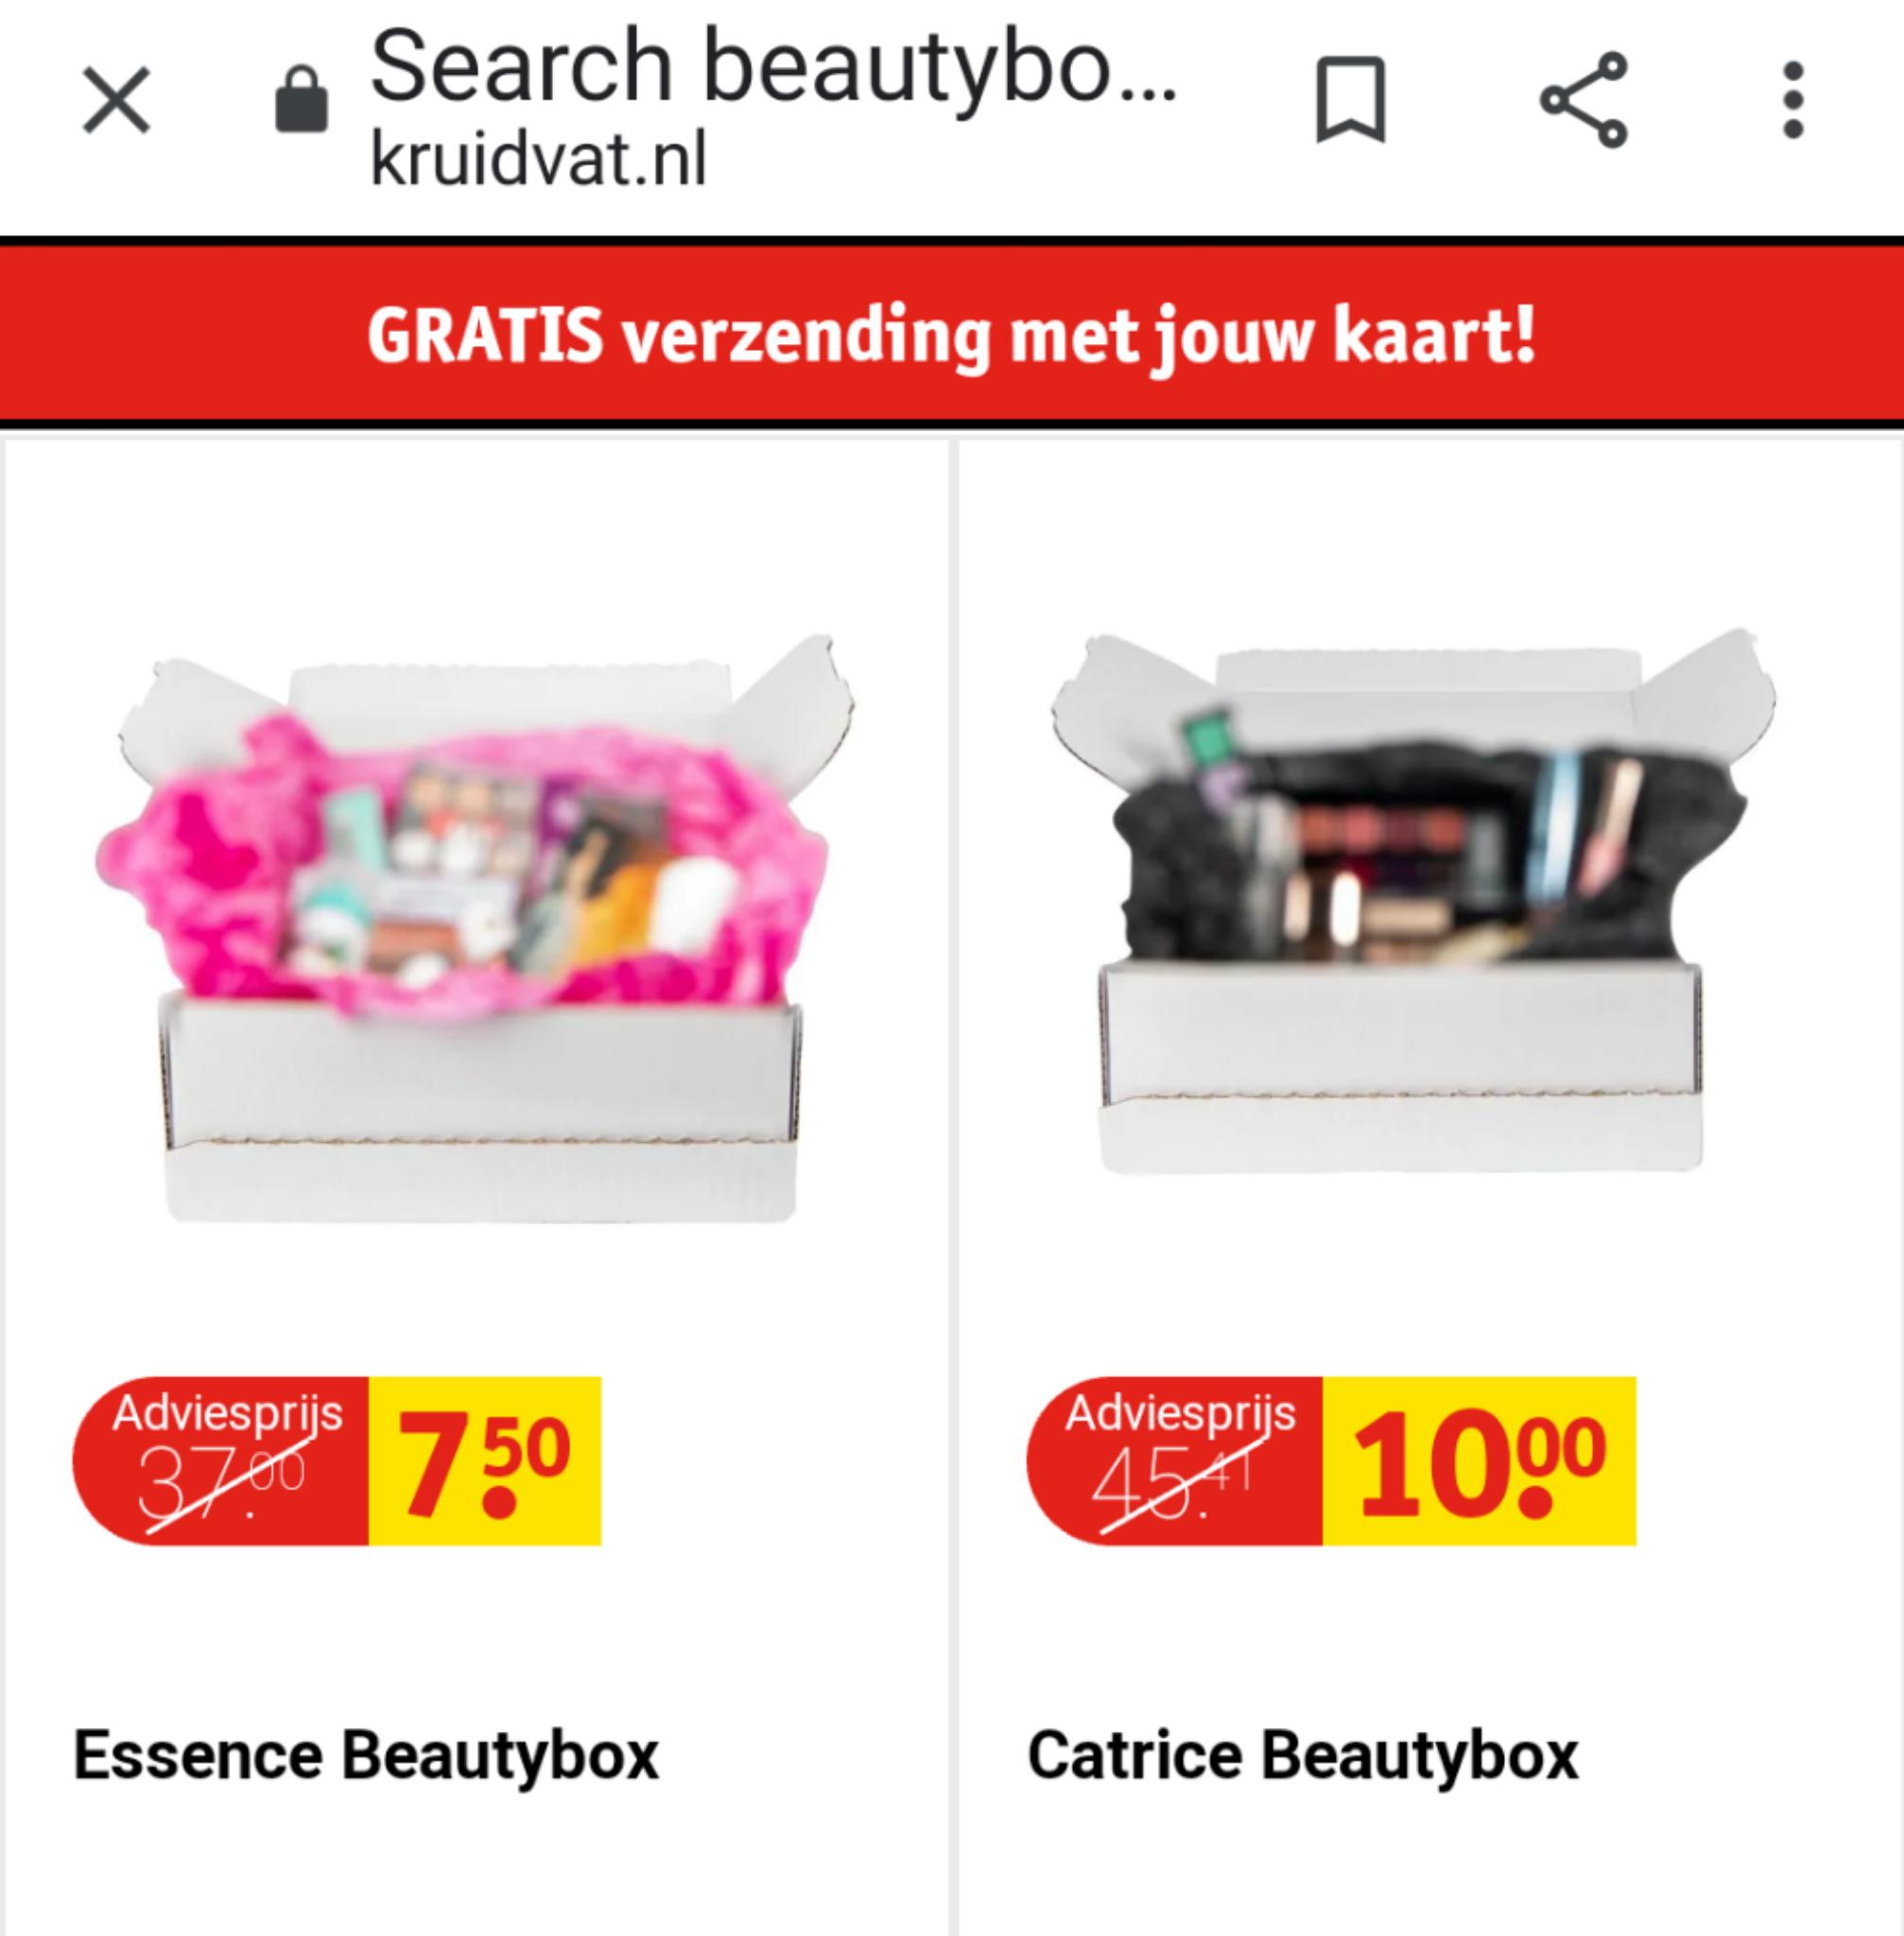 ESSENCE BEAUTYBOX 7,50 // CATRICE BEAUTYBOX 10 euro.